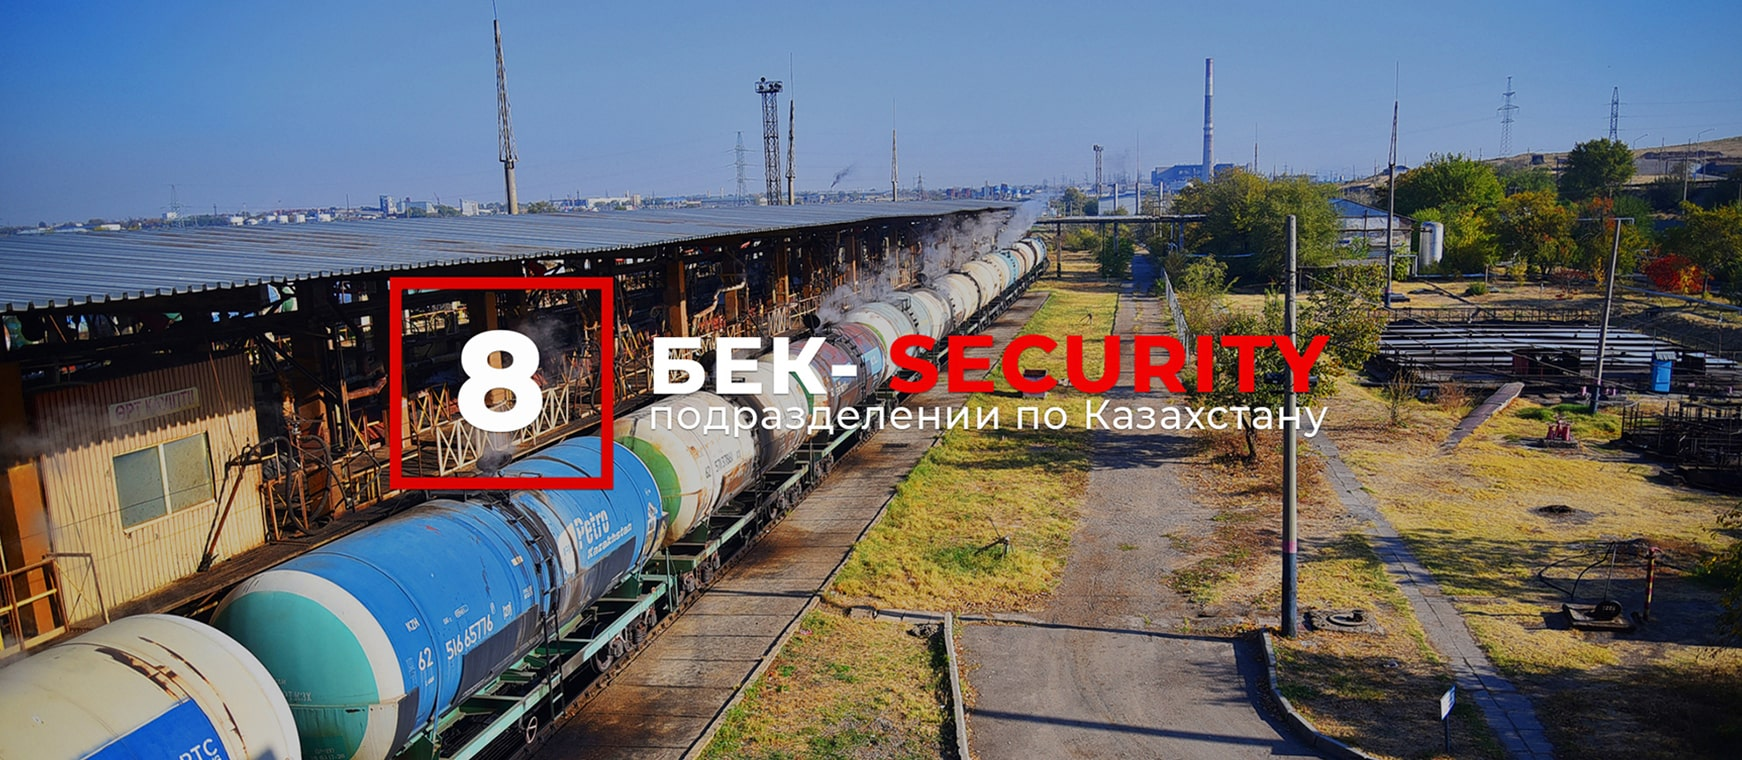 Бек Security